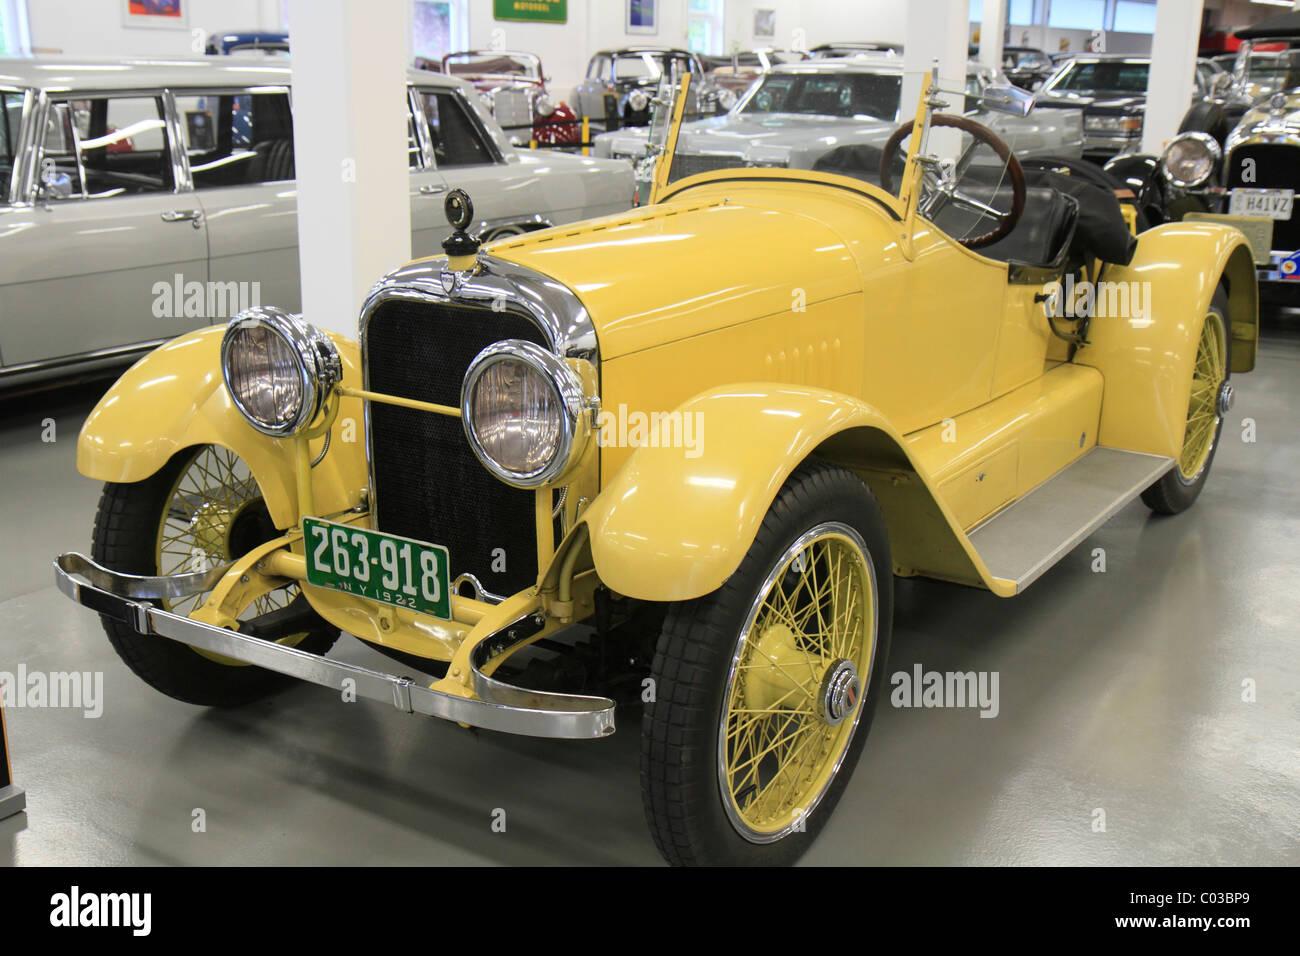 mercer series 5 raceabout vintage car built in 1922 autosammlung steim car museum schramberg